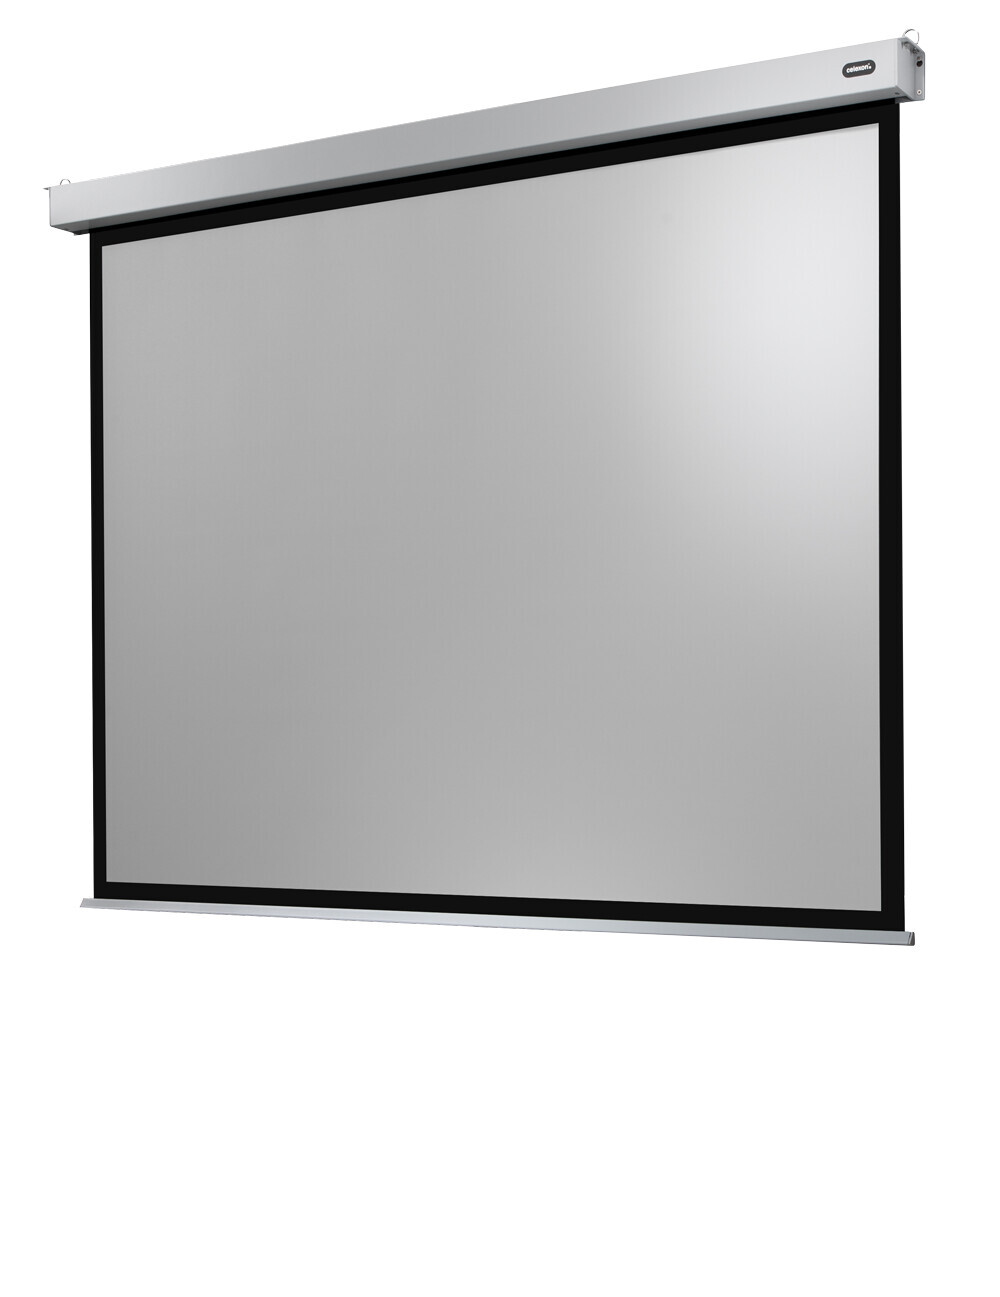 Celexon Electric Professional Plus Screen 280 x 210 cm